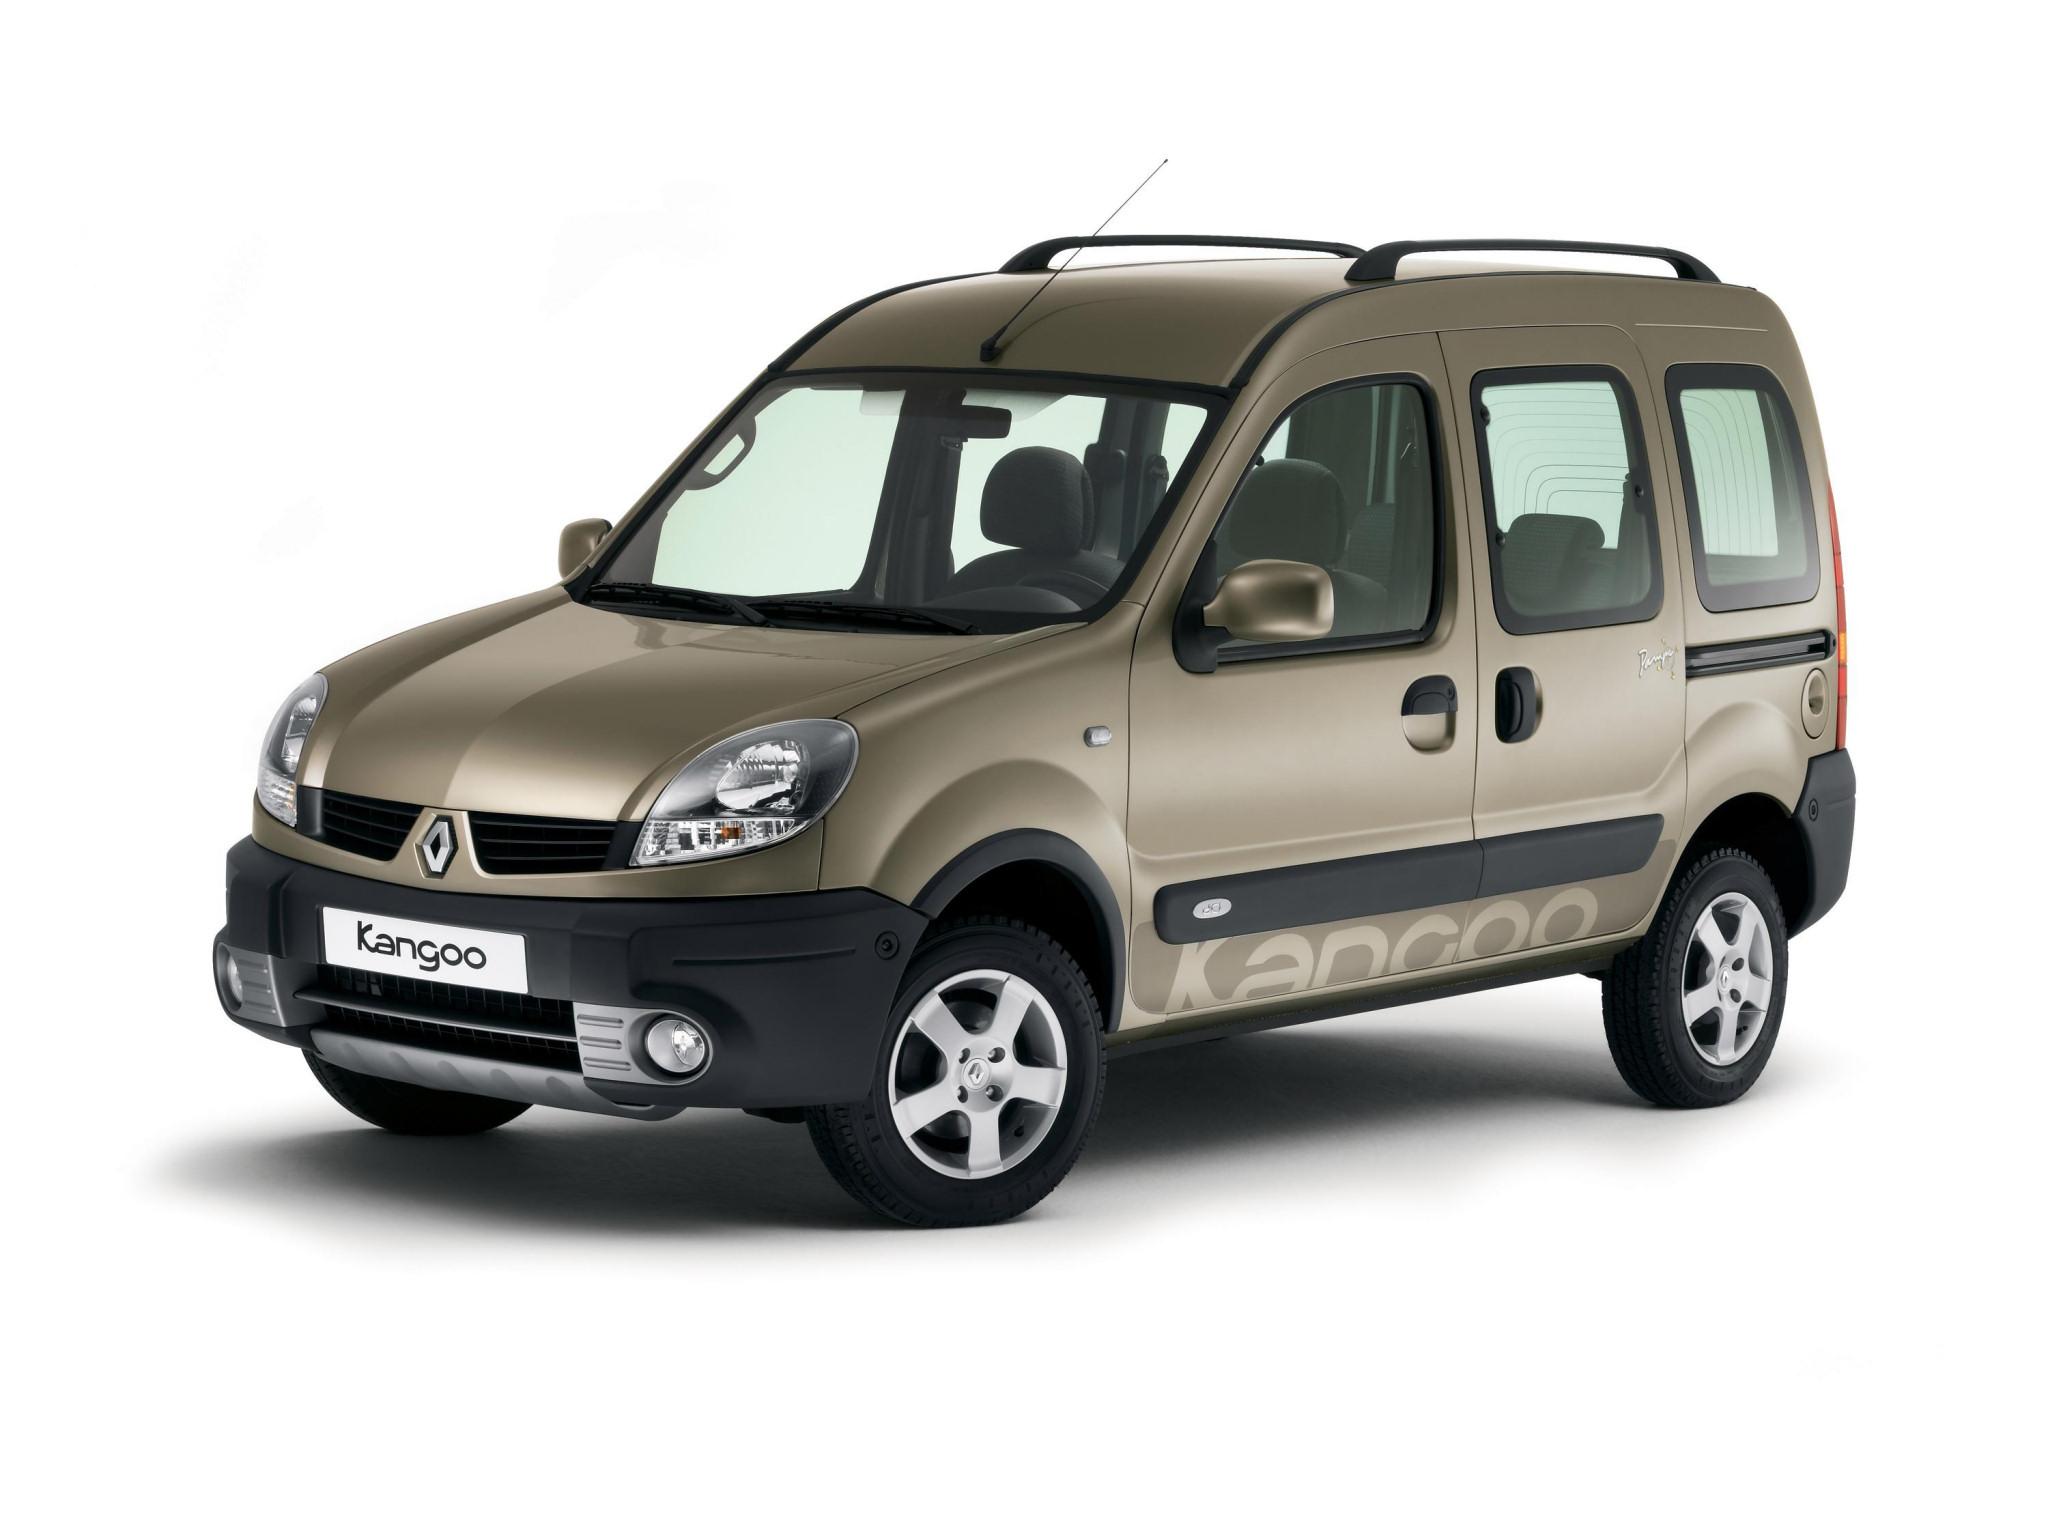 Renault Kangoo Cross 2006 Photo 01 | Car in pictures - car